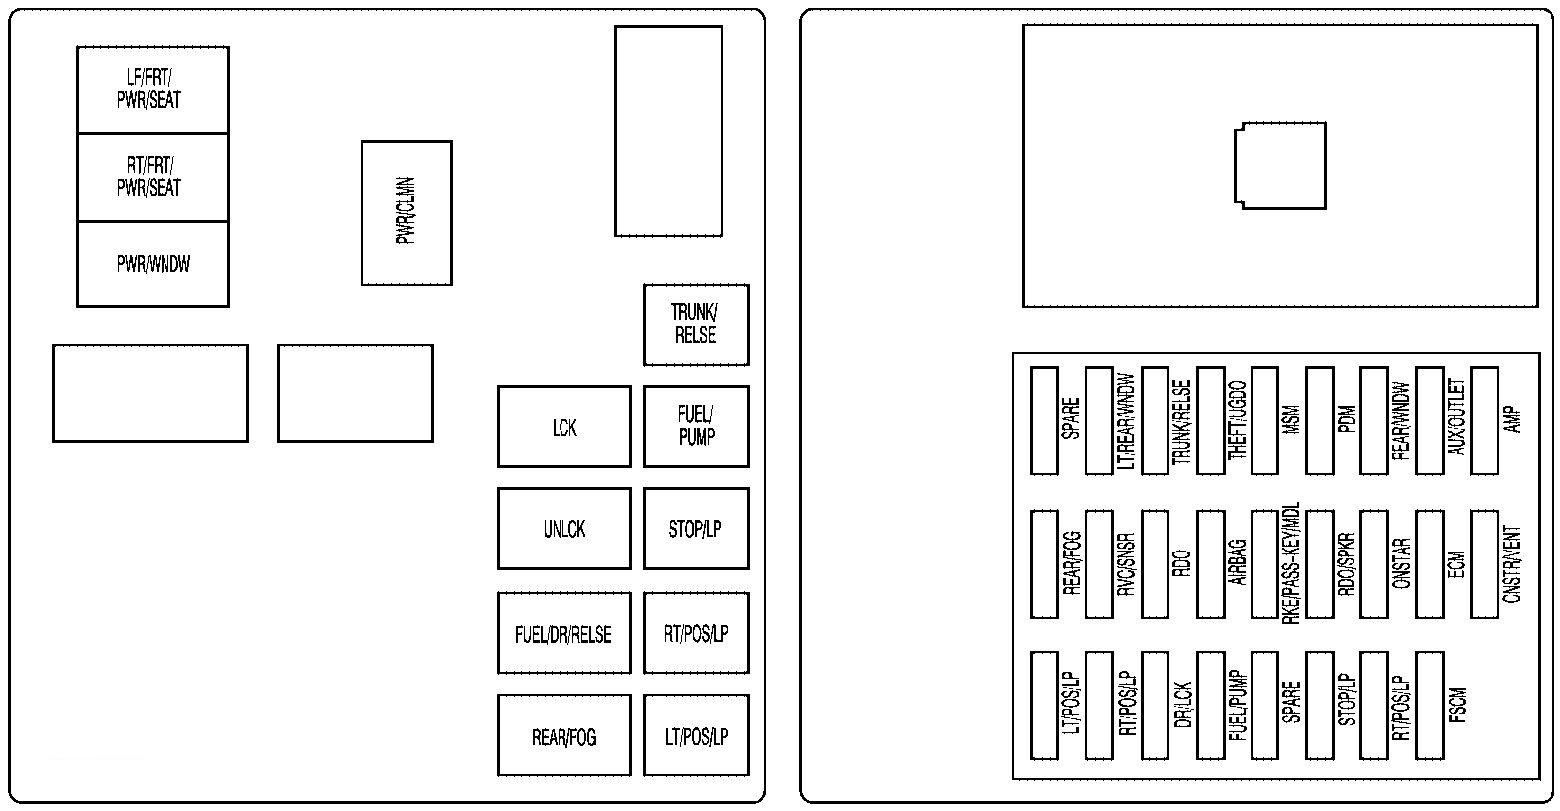 roger vivi ersaks: 2008 Cts Fuse Box Diagram Wiring Schematic